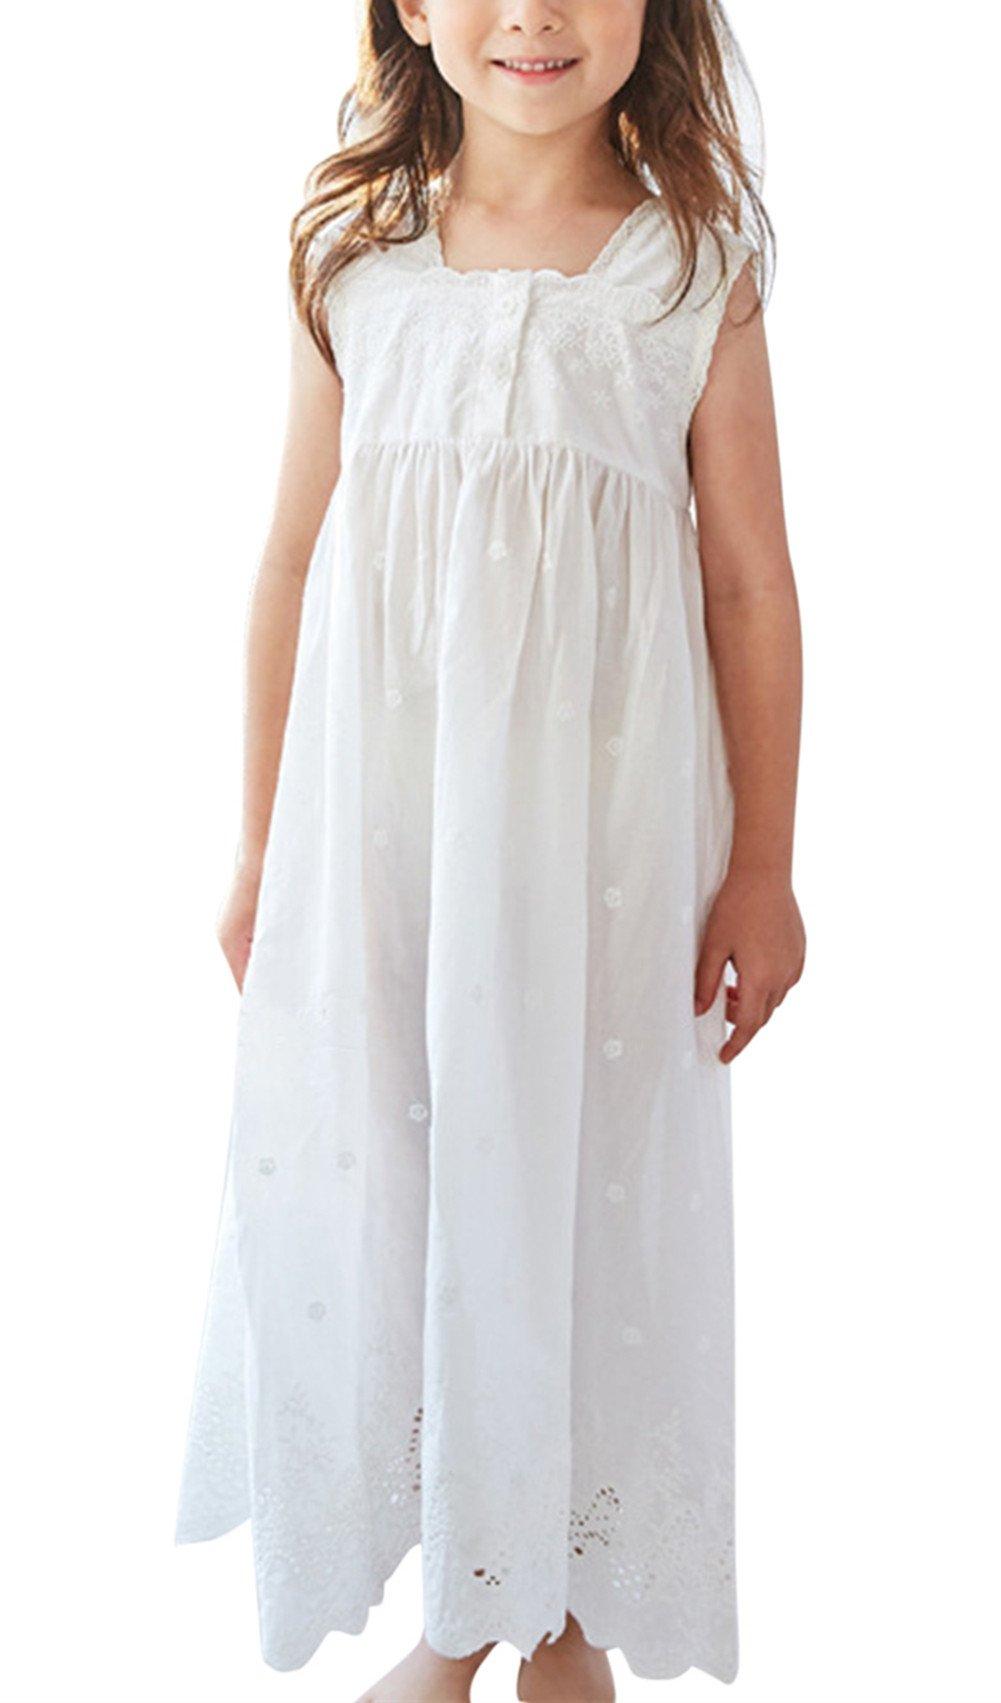 Aulase Kids Girls' Retro Lace Sleeveless Full Length Princess Dress White 4-5Y/Tag 120cm